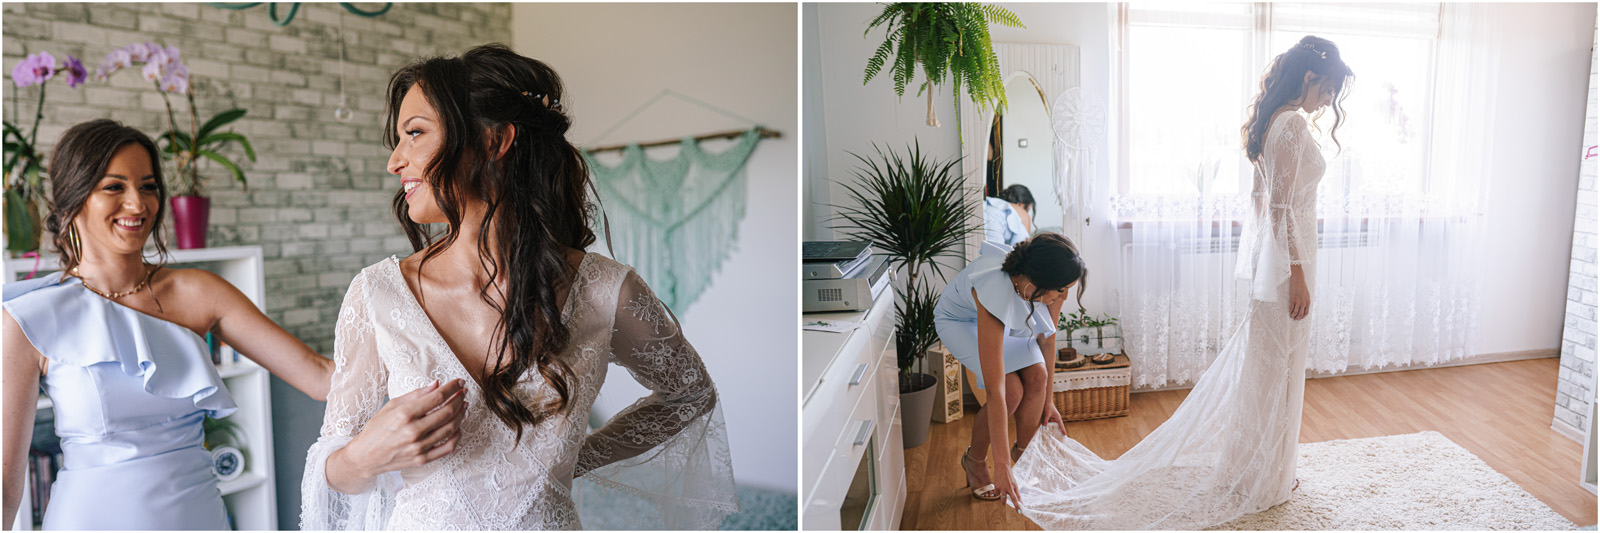 Ania & Mateusz | boho wesele w Stodole pod Kasztanami 12